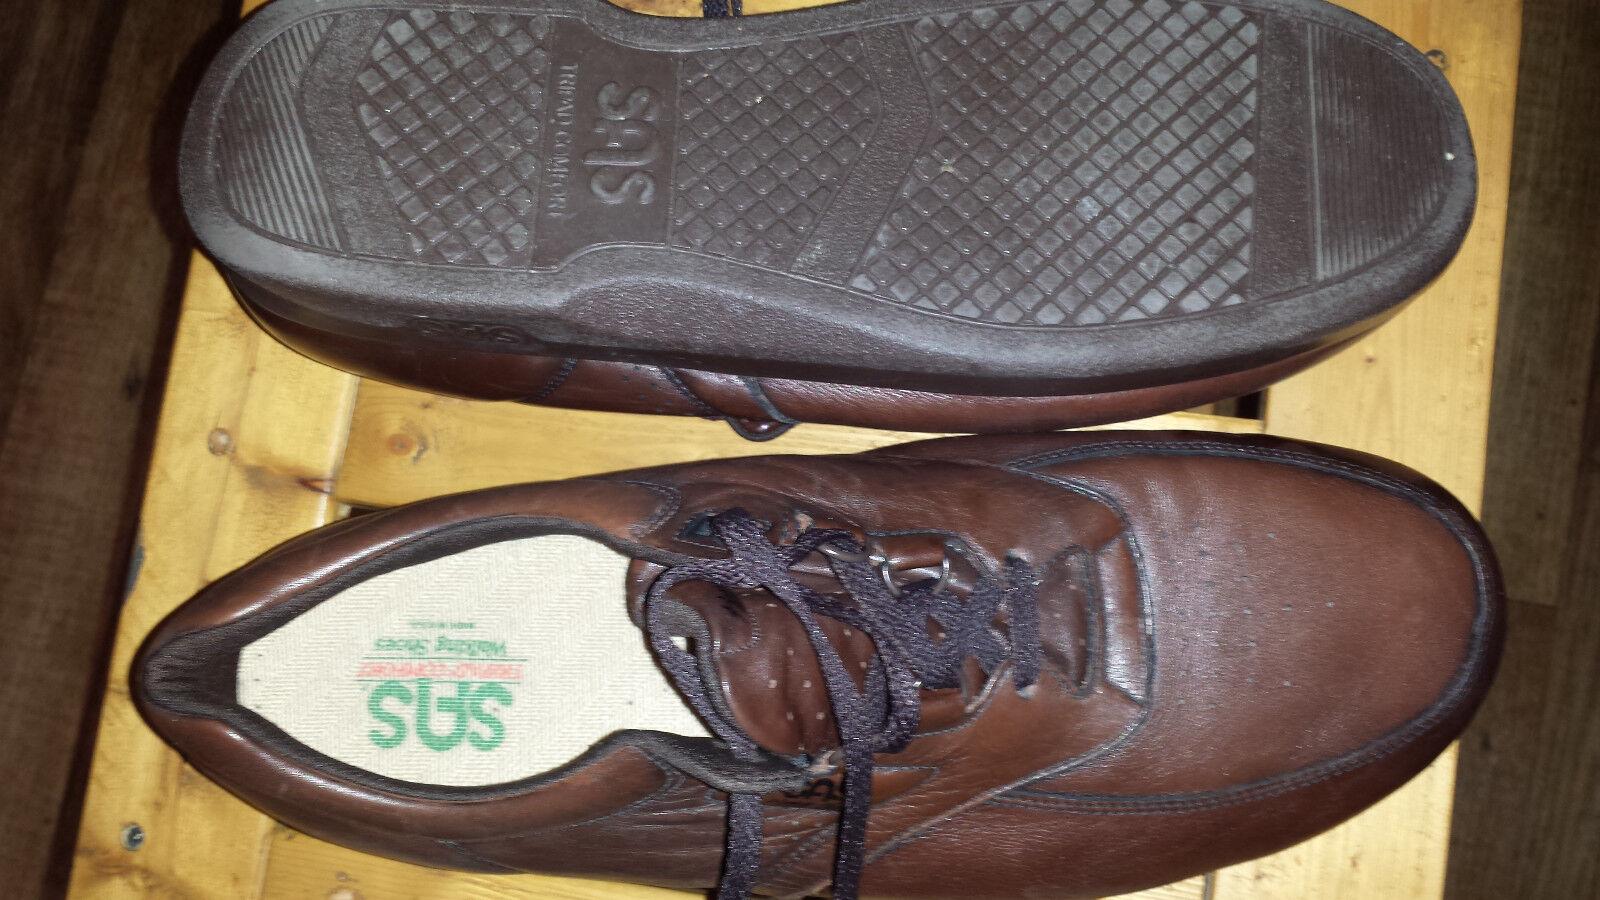 SAS Tripad Comfort Time Out Men's Brown Shoes Leather Sport Oxfords Shoes Brown 15 M a16bdf